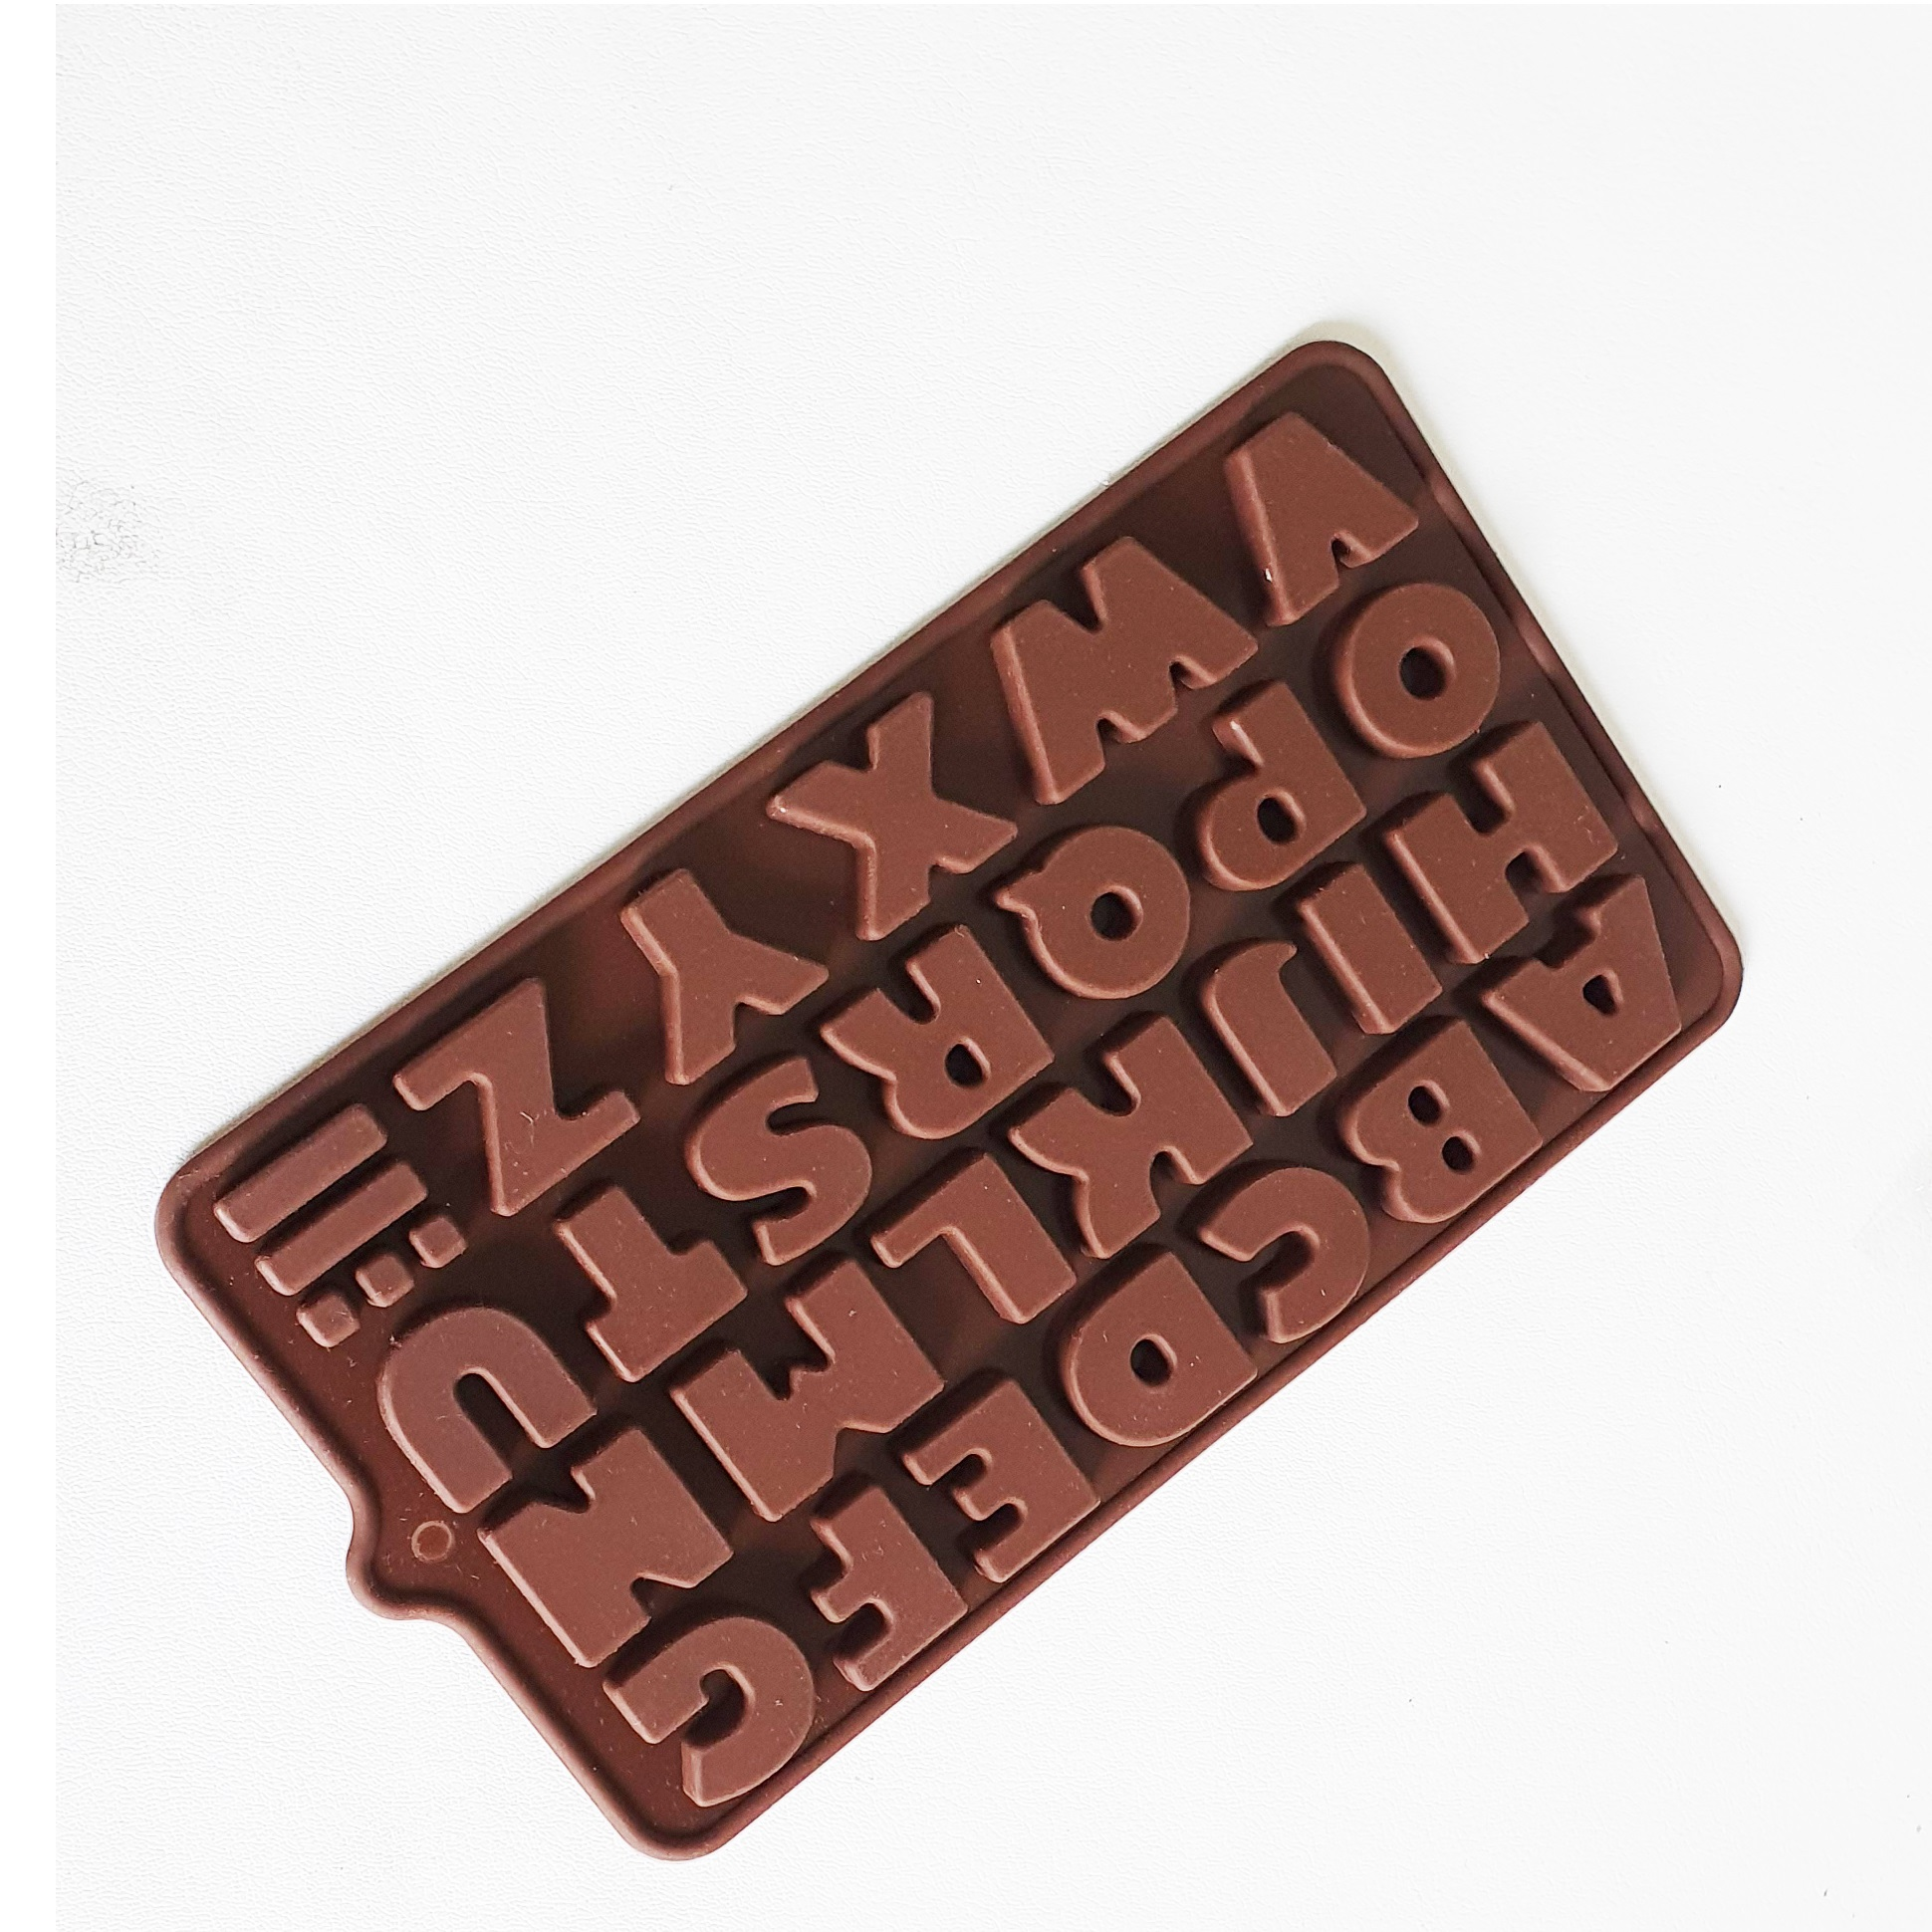 قالب شکلات طرح انگلیسی کد Mhr-326